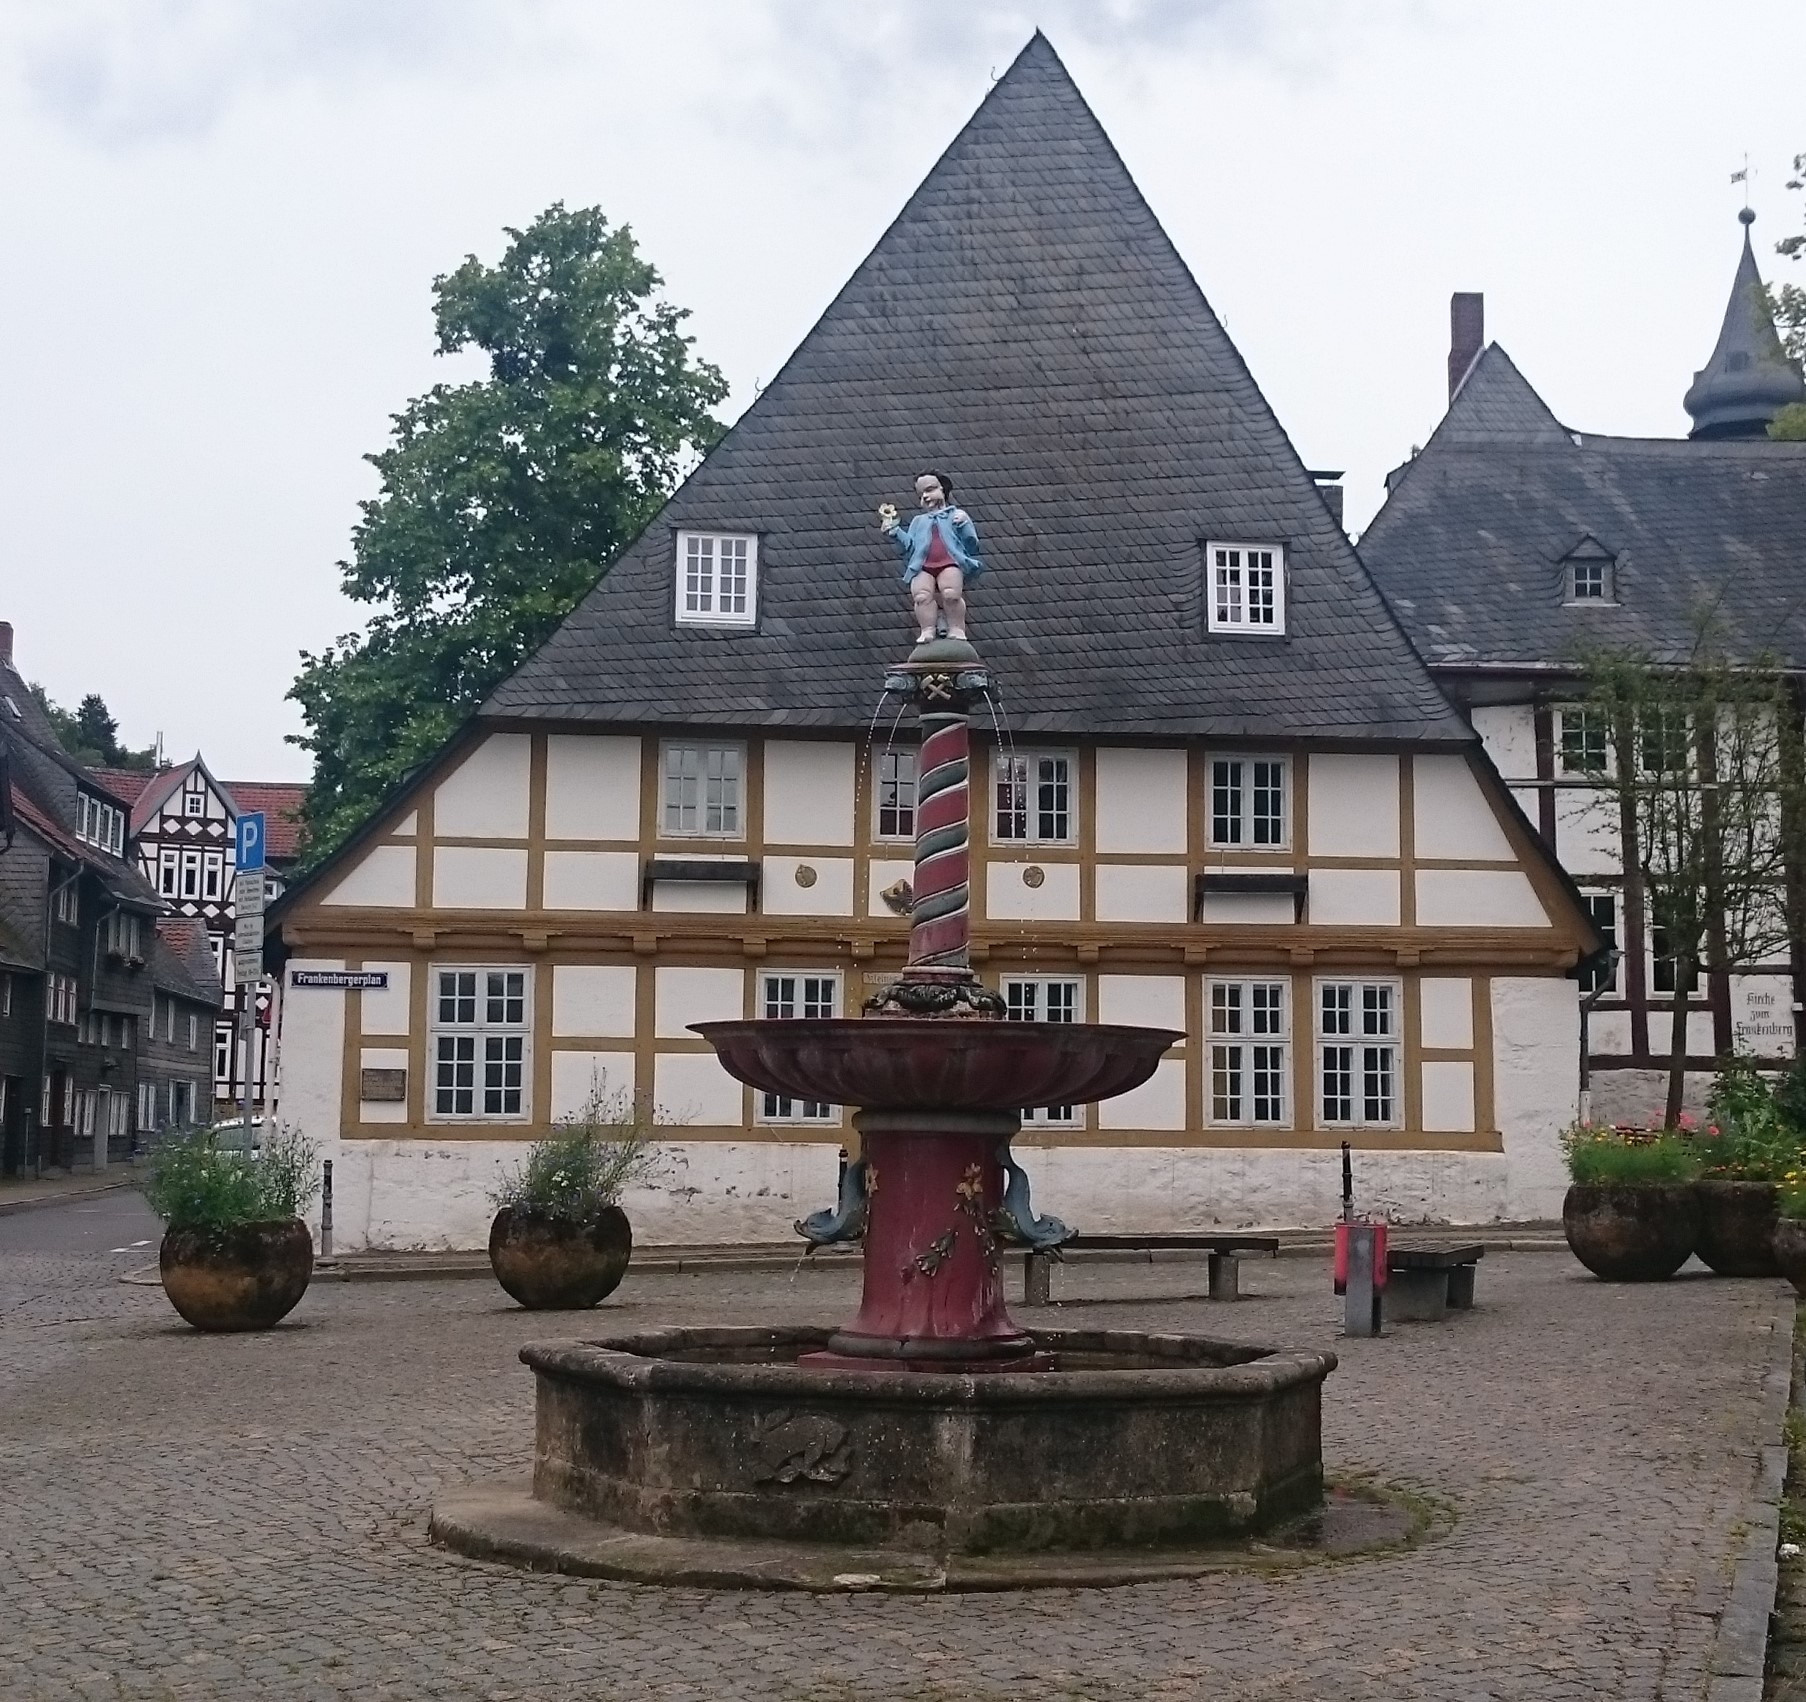 16.06.2016 LF - Goslar (1)